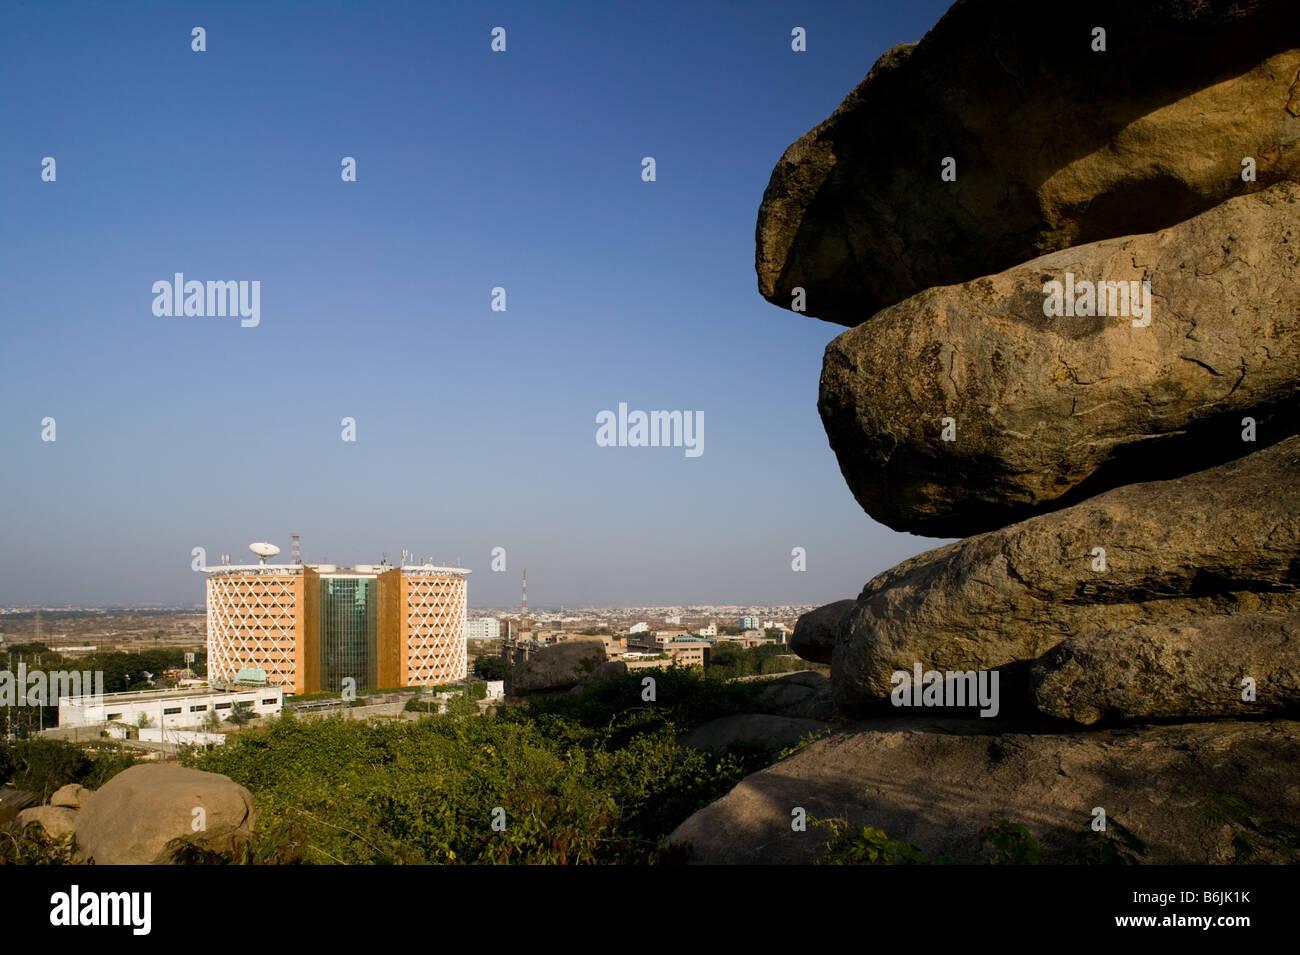 INDIA Andhra Pradesh, Hyderabad: Hitec City, centro importante di Indian Software Call Center industria. Cybertower Immagini Stock